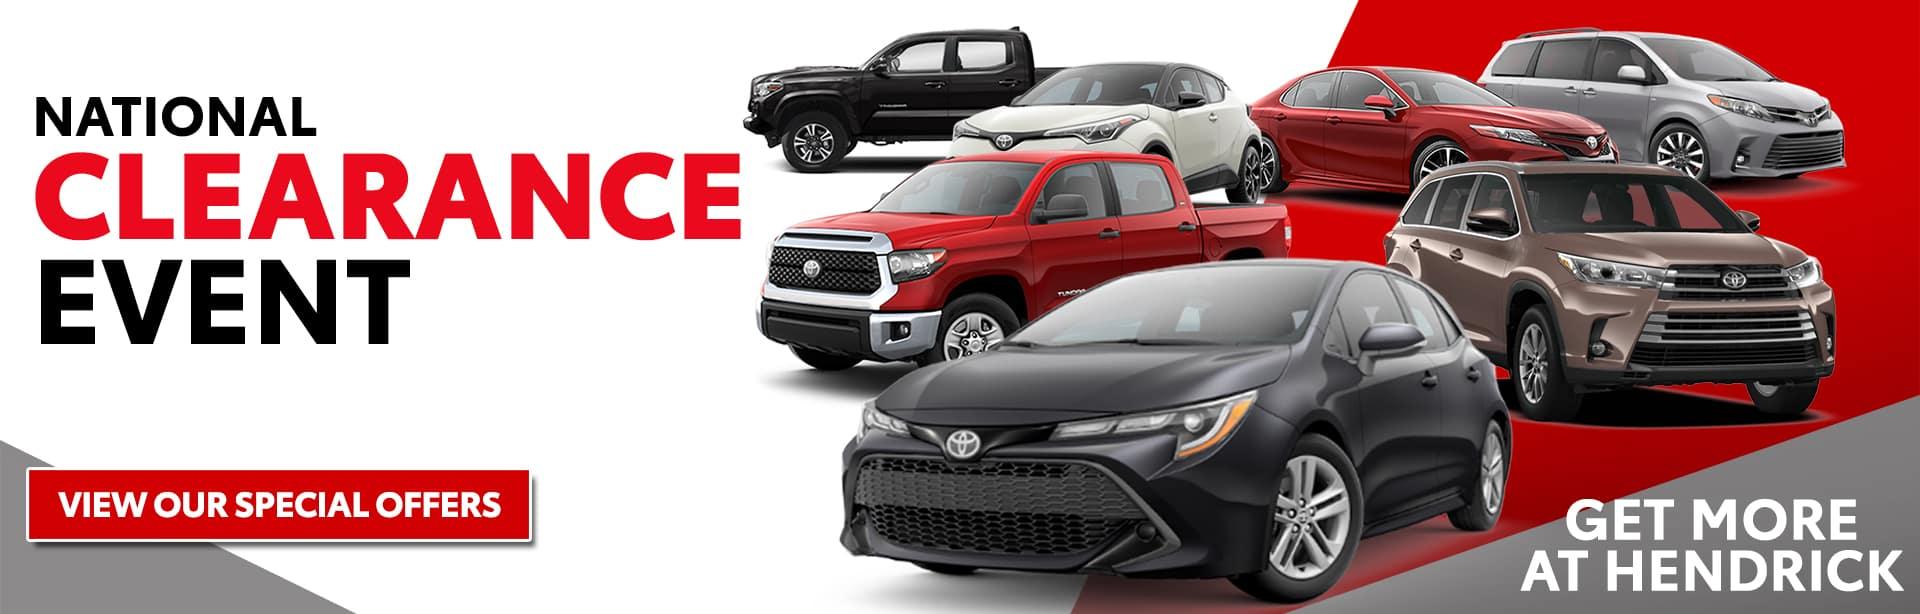 Hendrick Toyota Concord | Toyota Dealer in Concord, NC